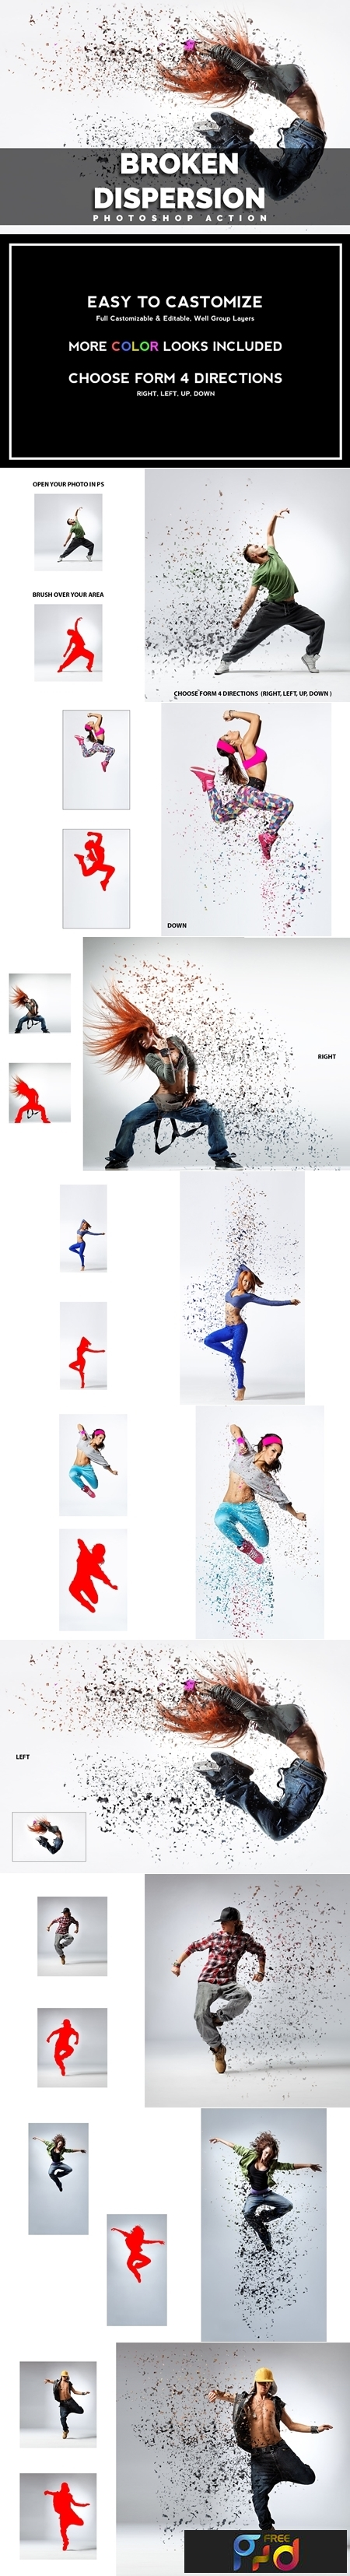 Broken Dispersion Photoshop Action 3600977 1